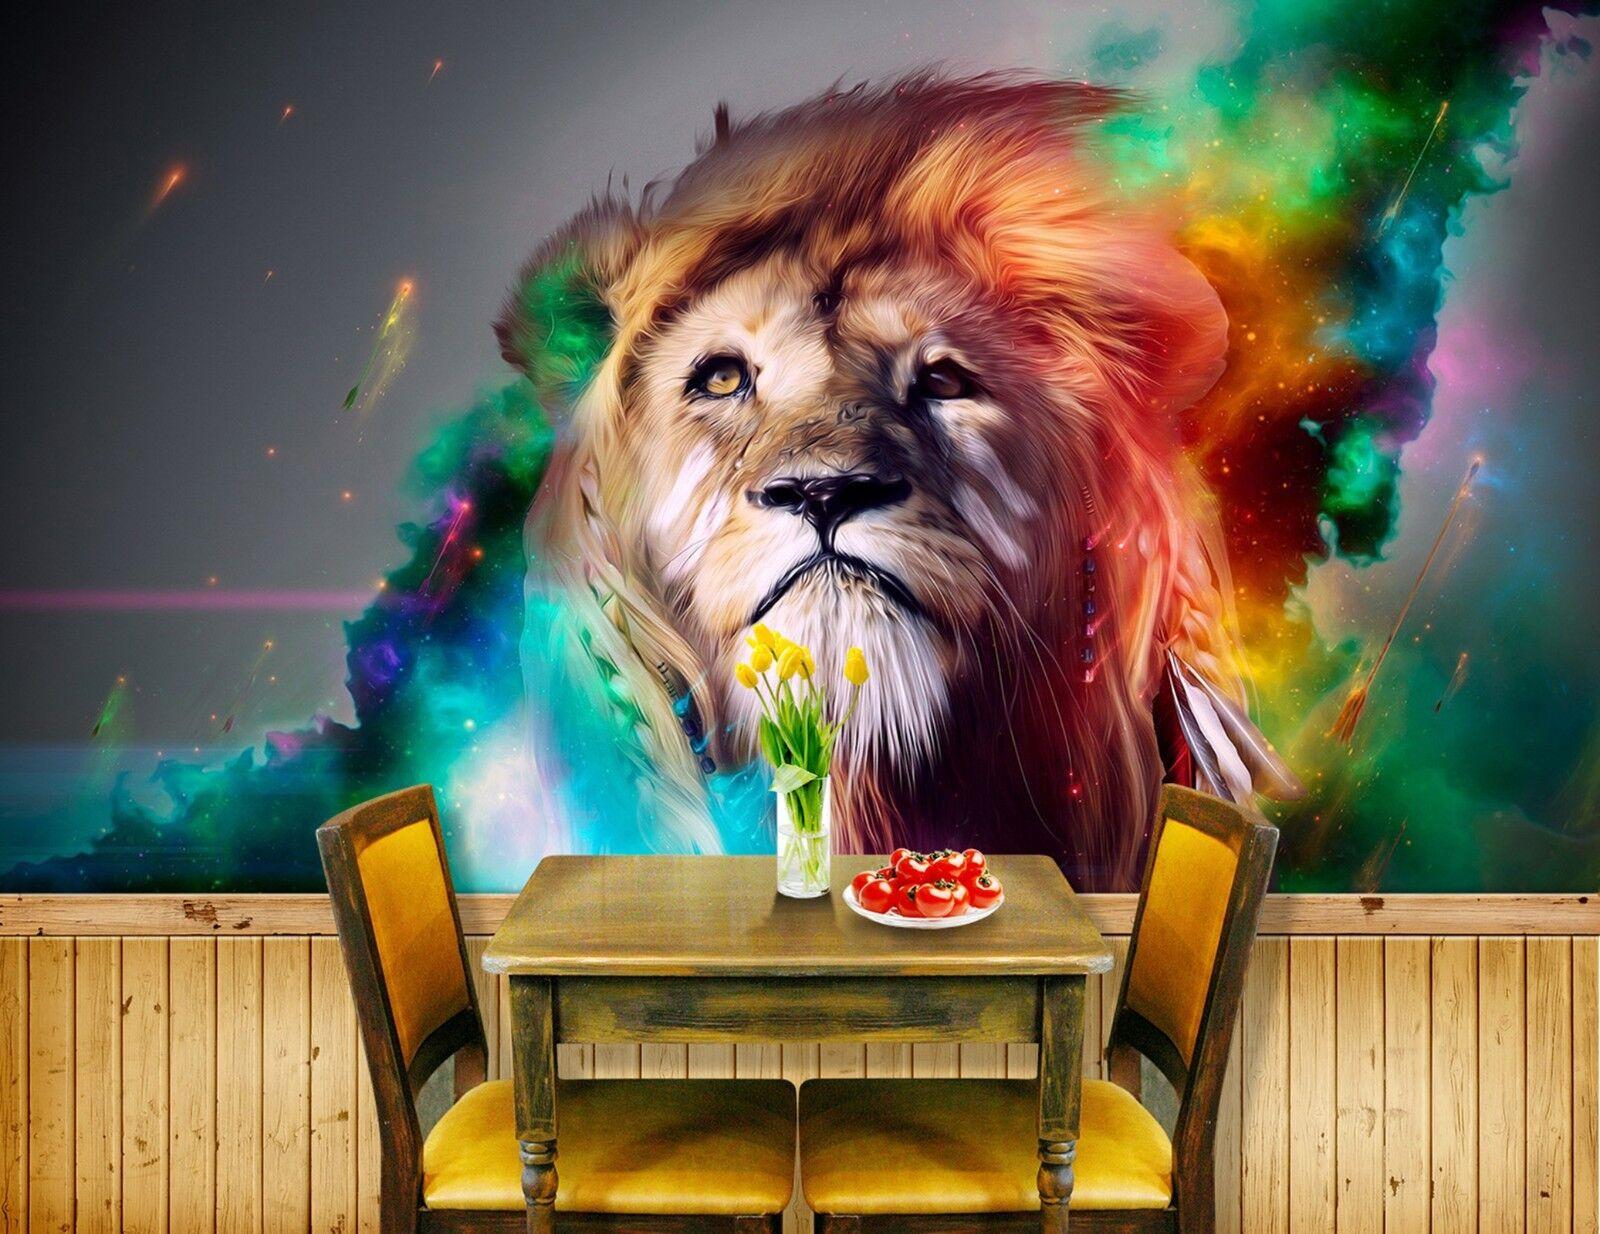 3D Gemalter Löwe Flamme 893 893 893 Tapete Wandgemälde Tapeten Bild Familie DE Lemon | Exquisite Verarbeitung  28f796